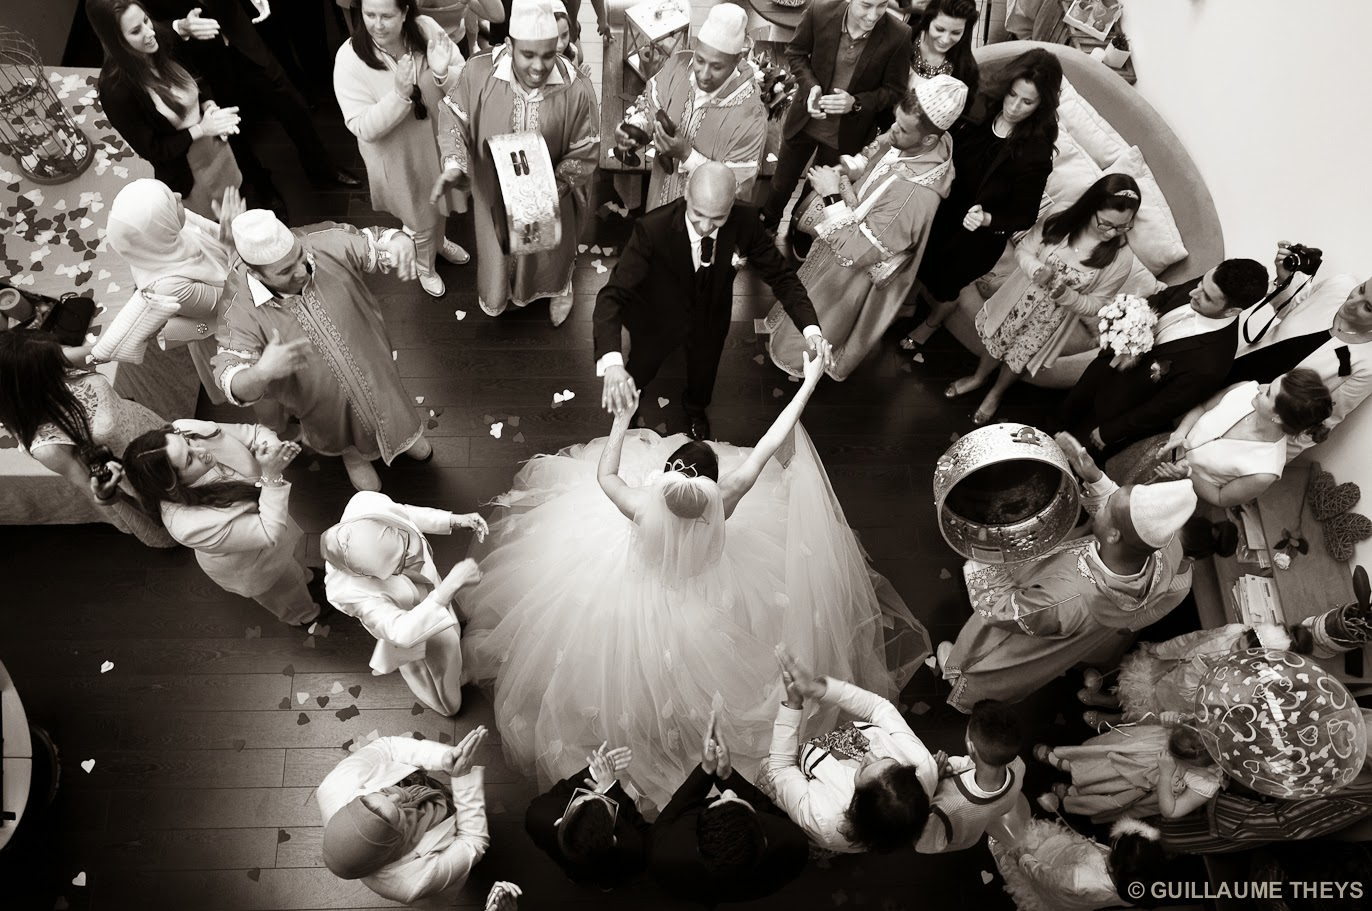 photographe mariage tourcoing - Photographe Mariage Tourcoing